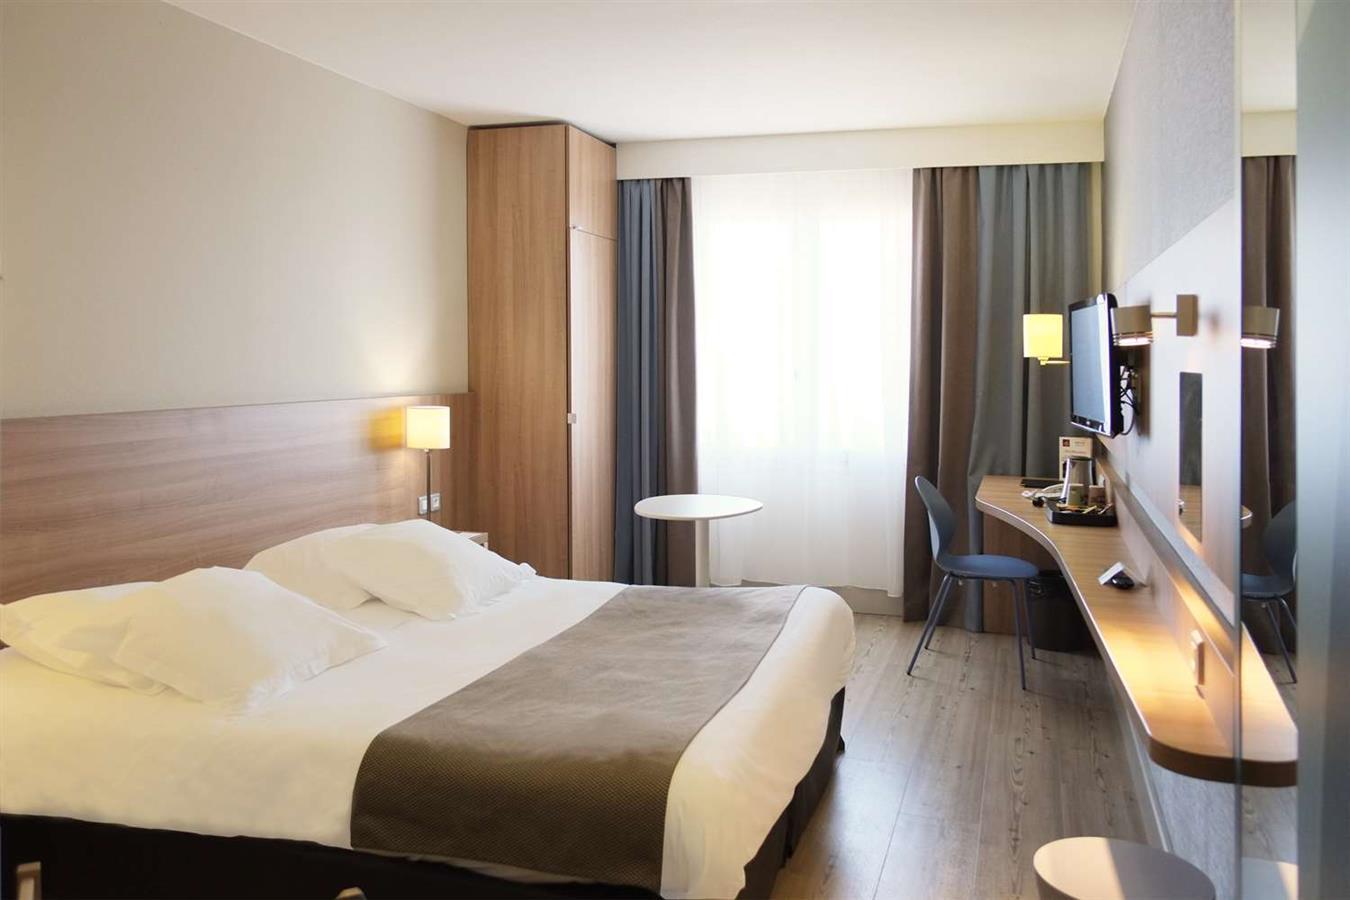 hotel in ajaccio bw plus ajaccio amiraute ajaccio. Black Bedroom Furniture Sets. Home Design Ideas